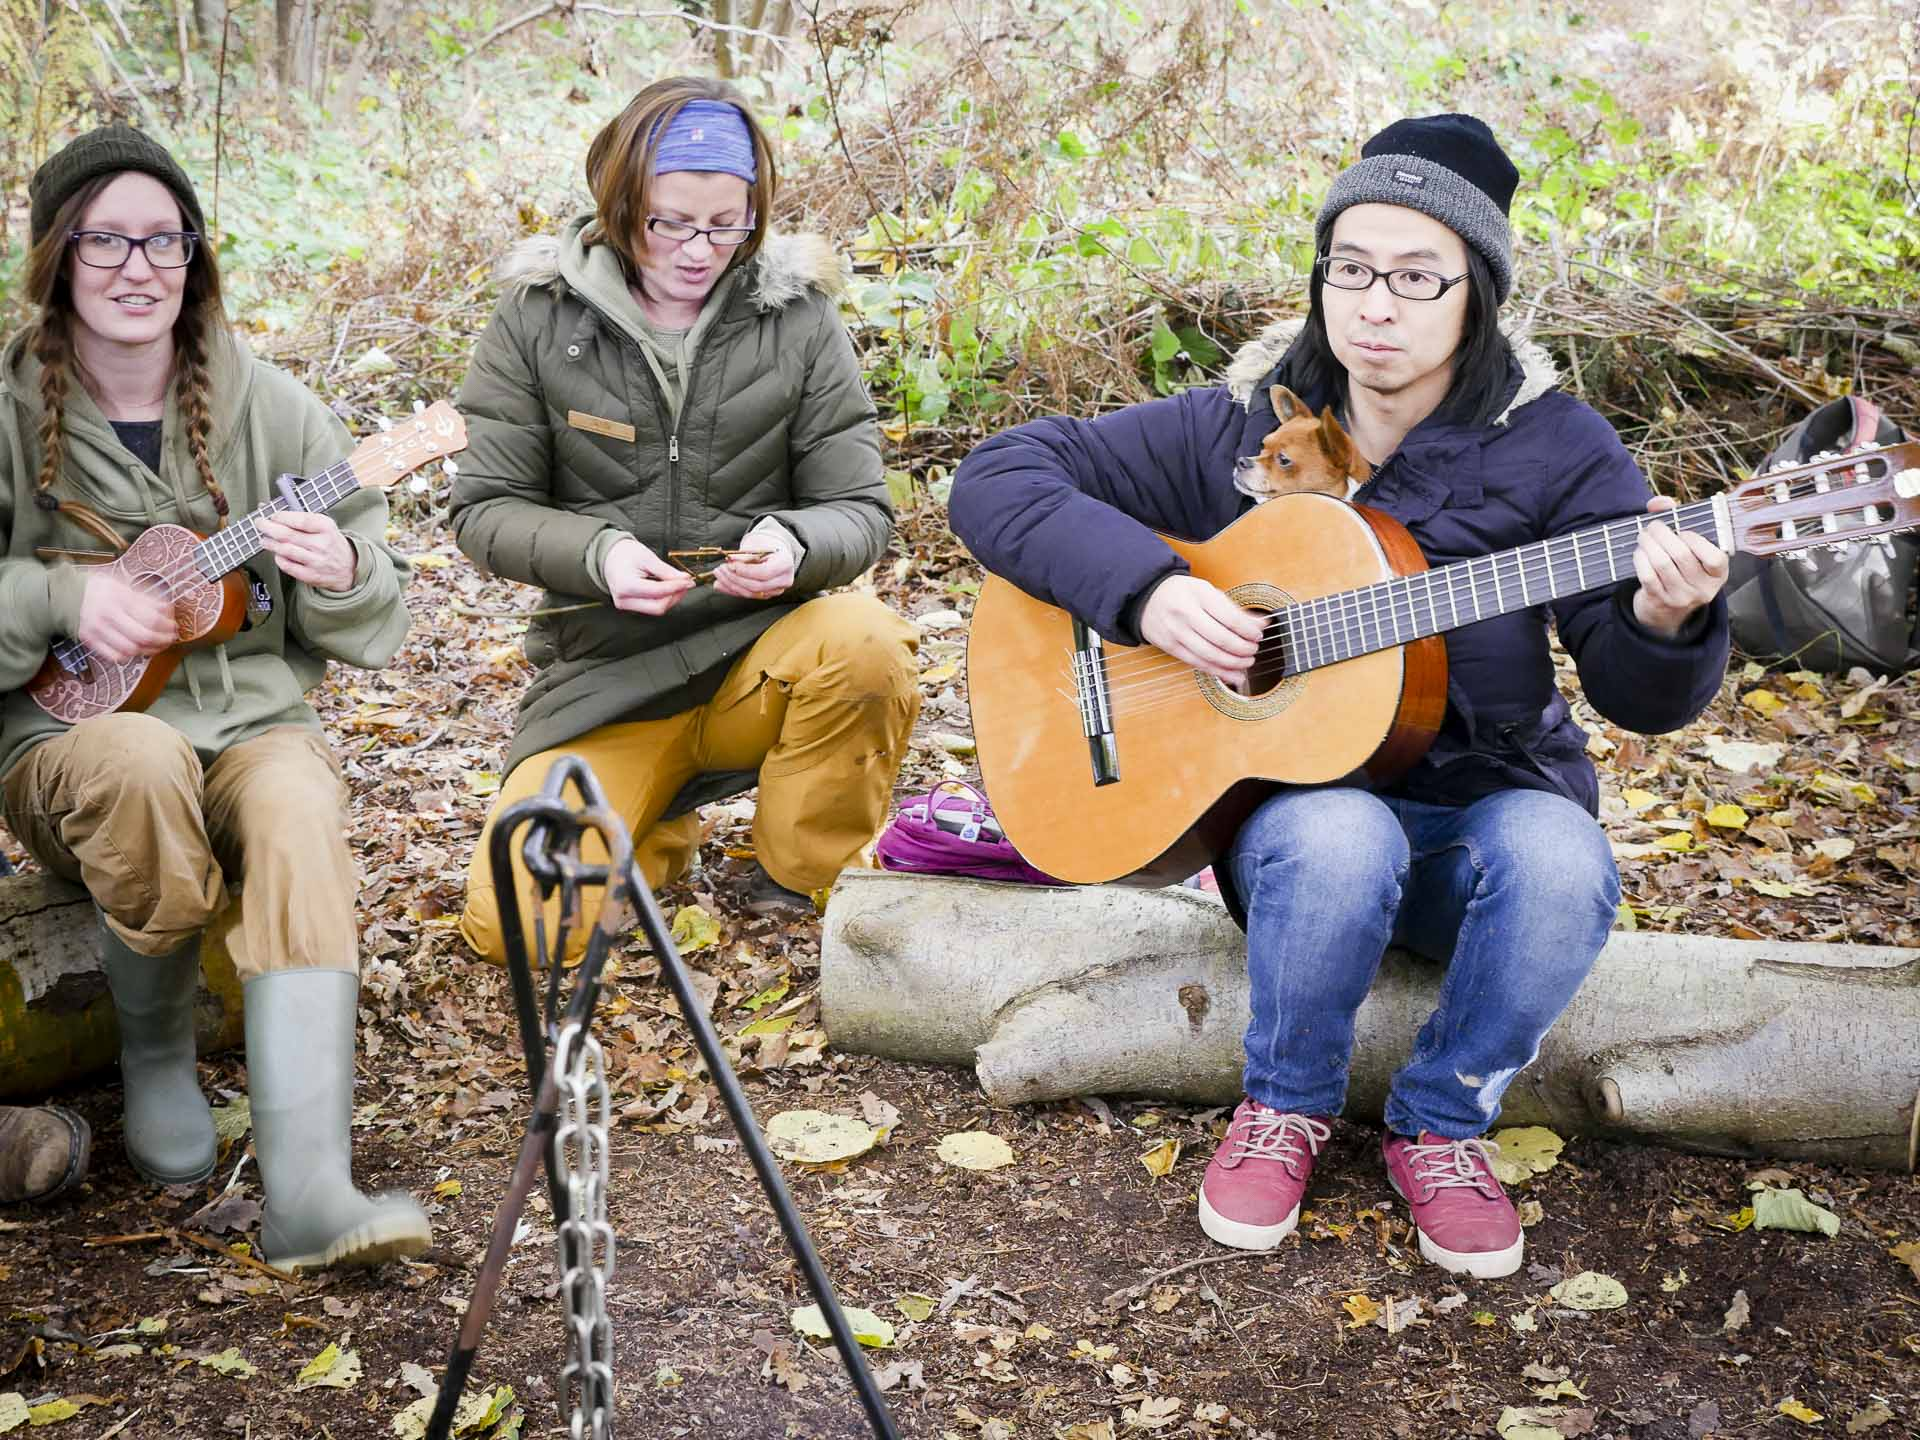 Campfire sing along